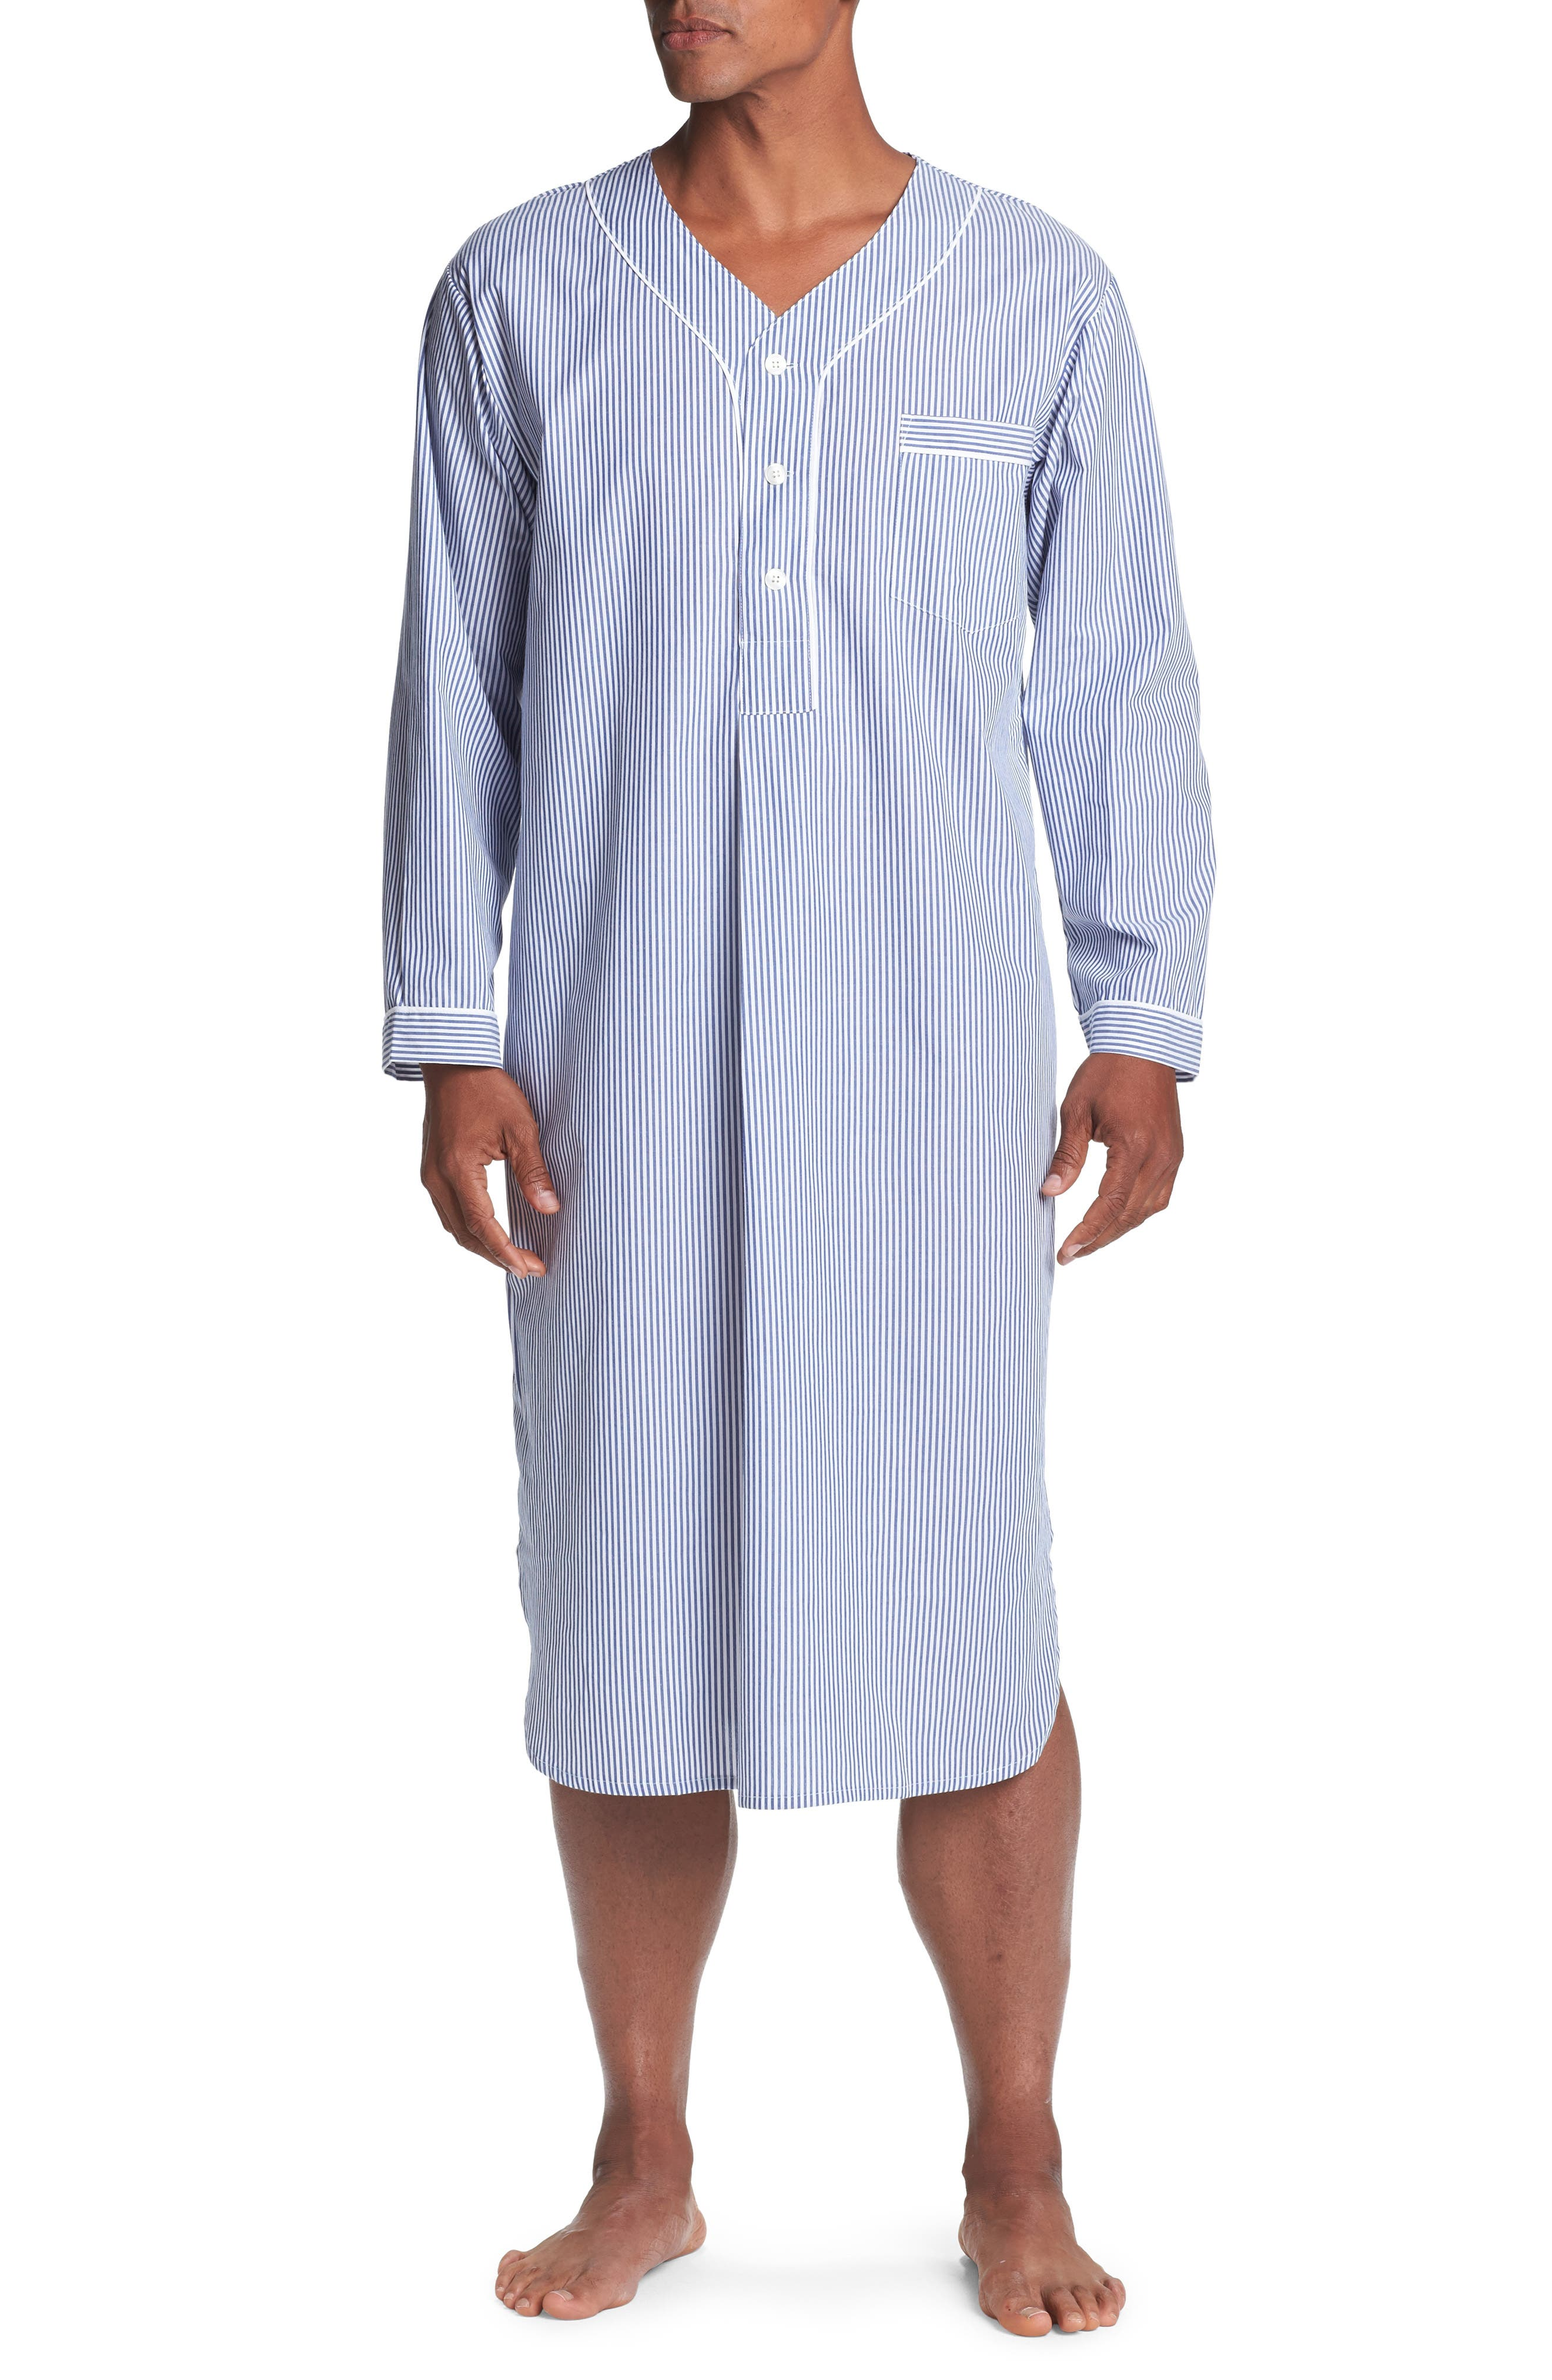 1940s Men's Underwear: Briefs, Boxers, Unions, & Socks Mens Majestic International Cotton Nightshirt Size SmallMedium - Blue $60.00 AT vintagedancer.com